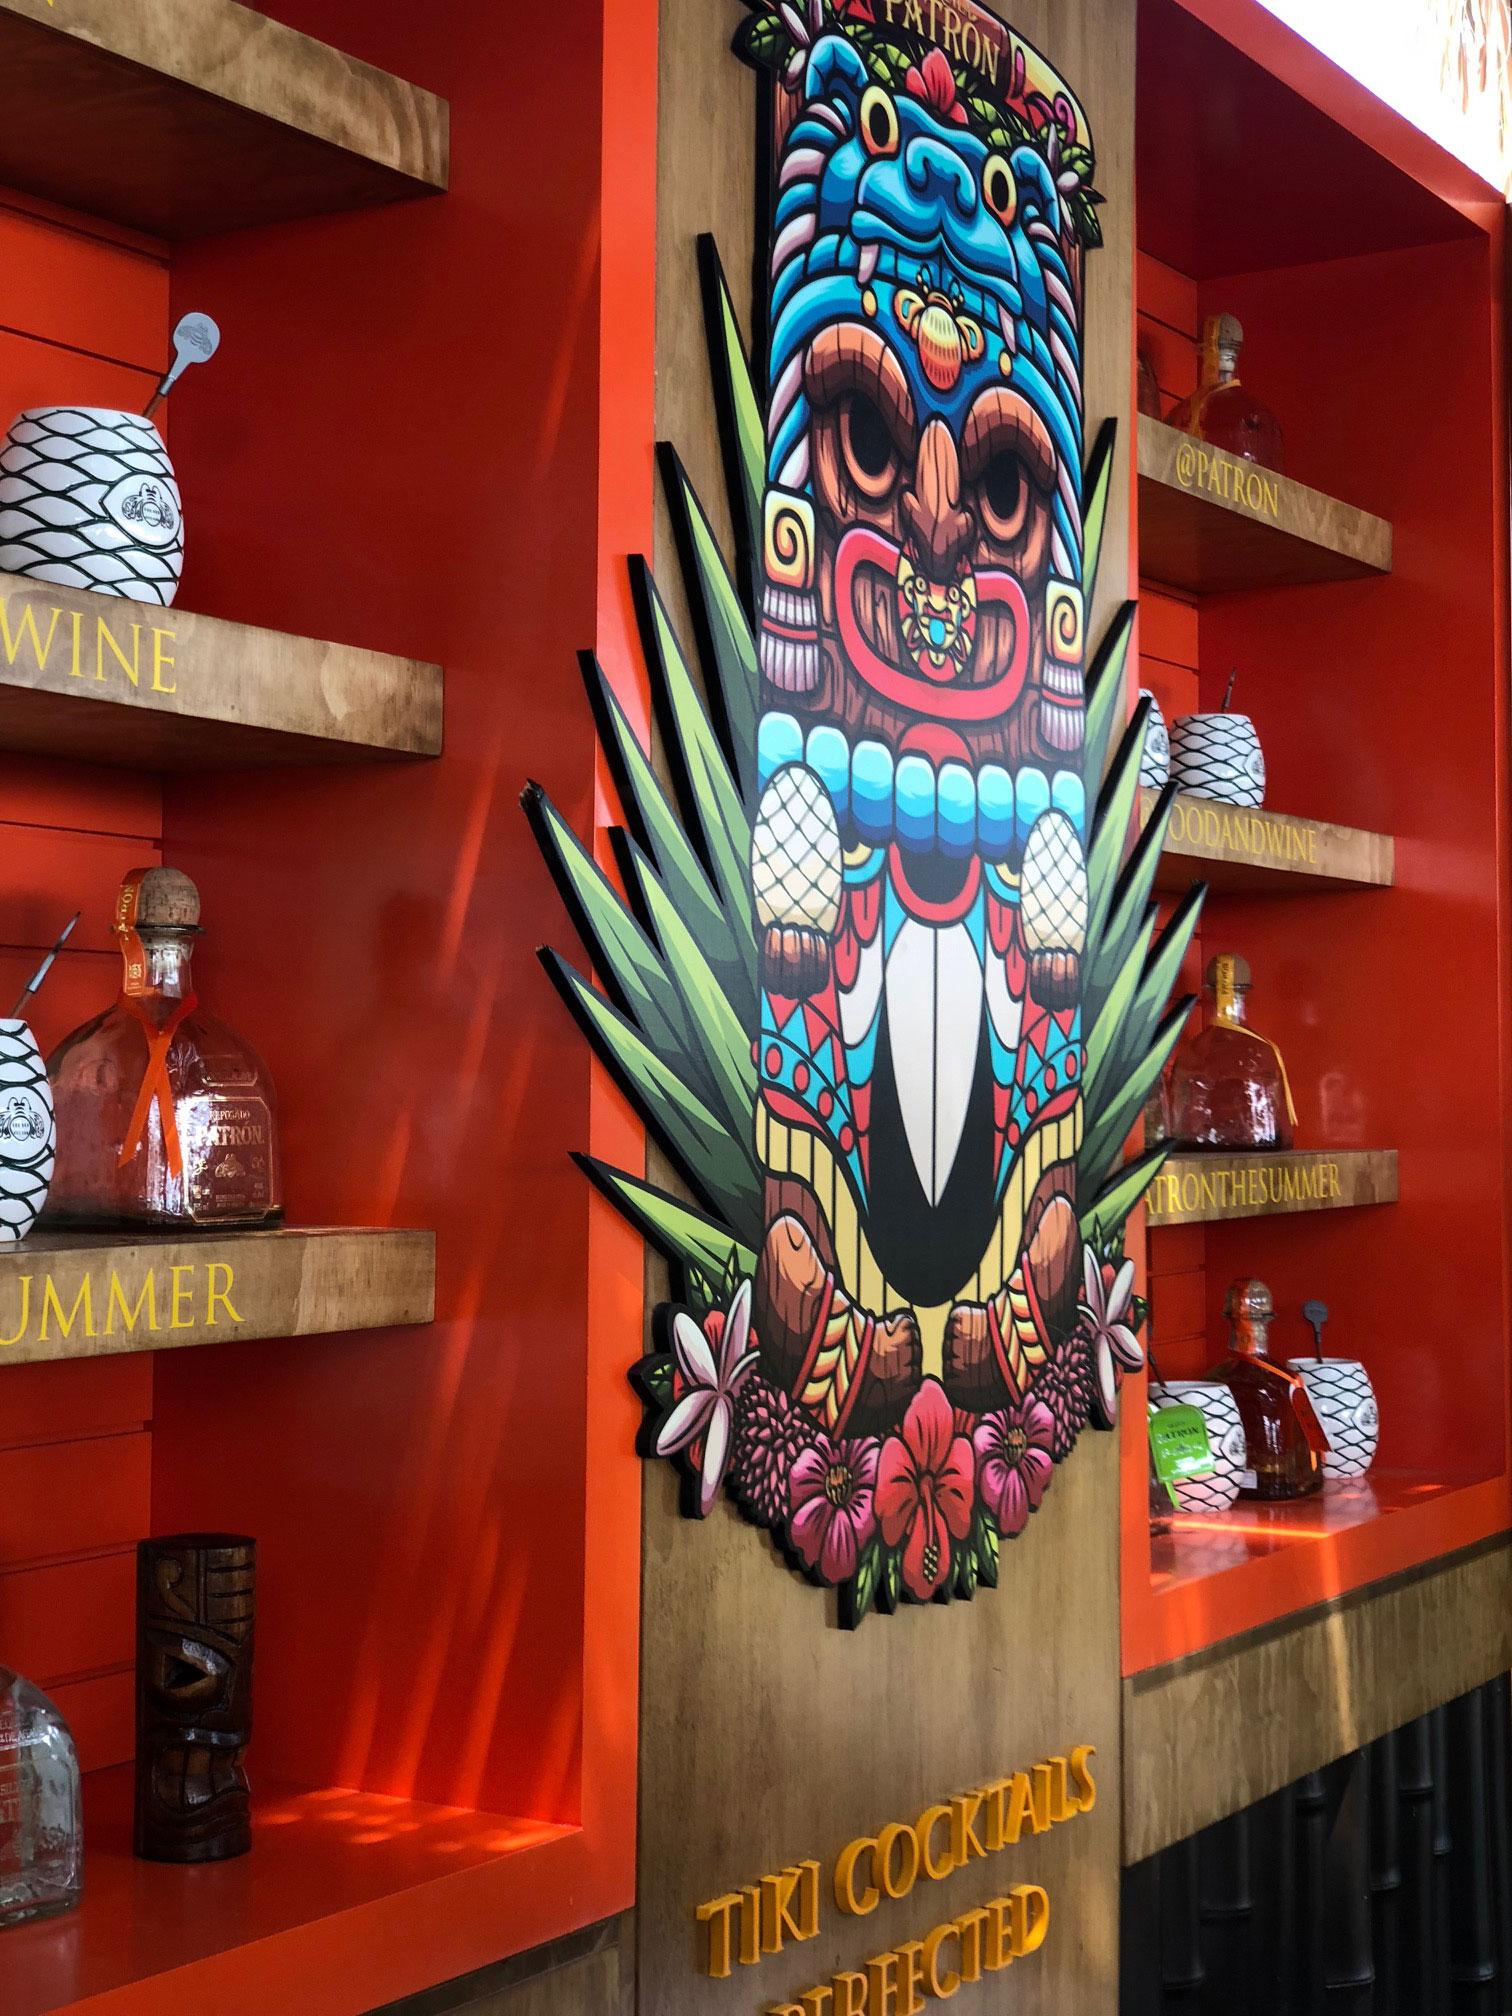 Patron Tequila Tiki sign